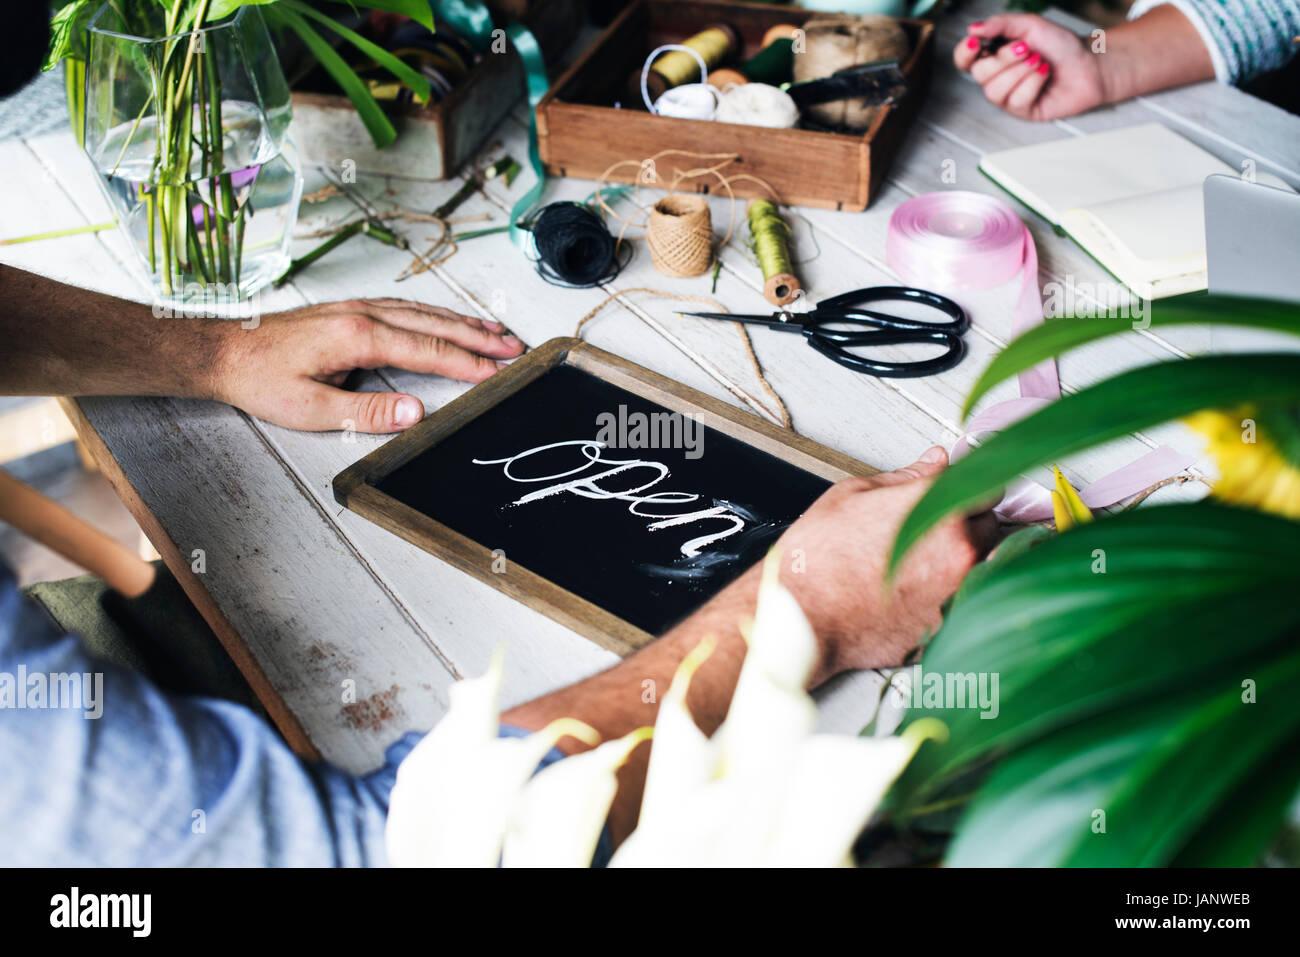 Handicraft flower shop open for service - Stock Image